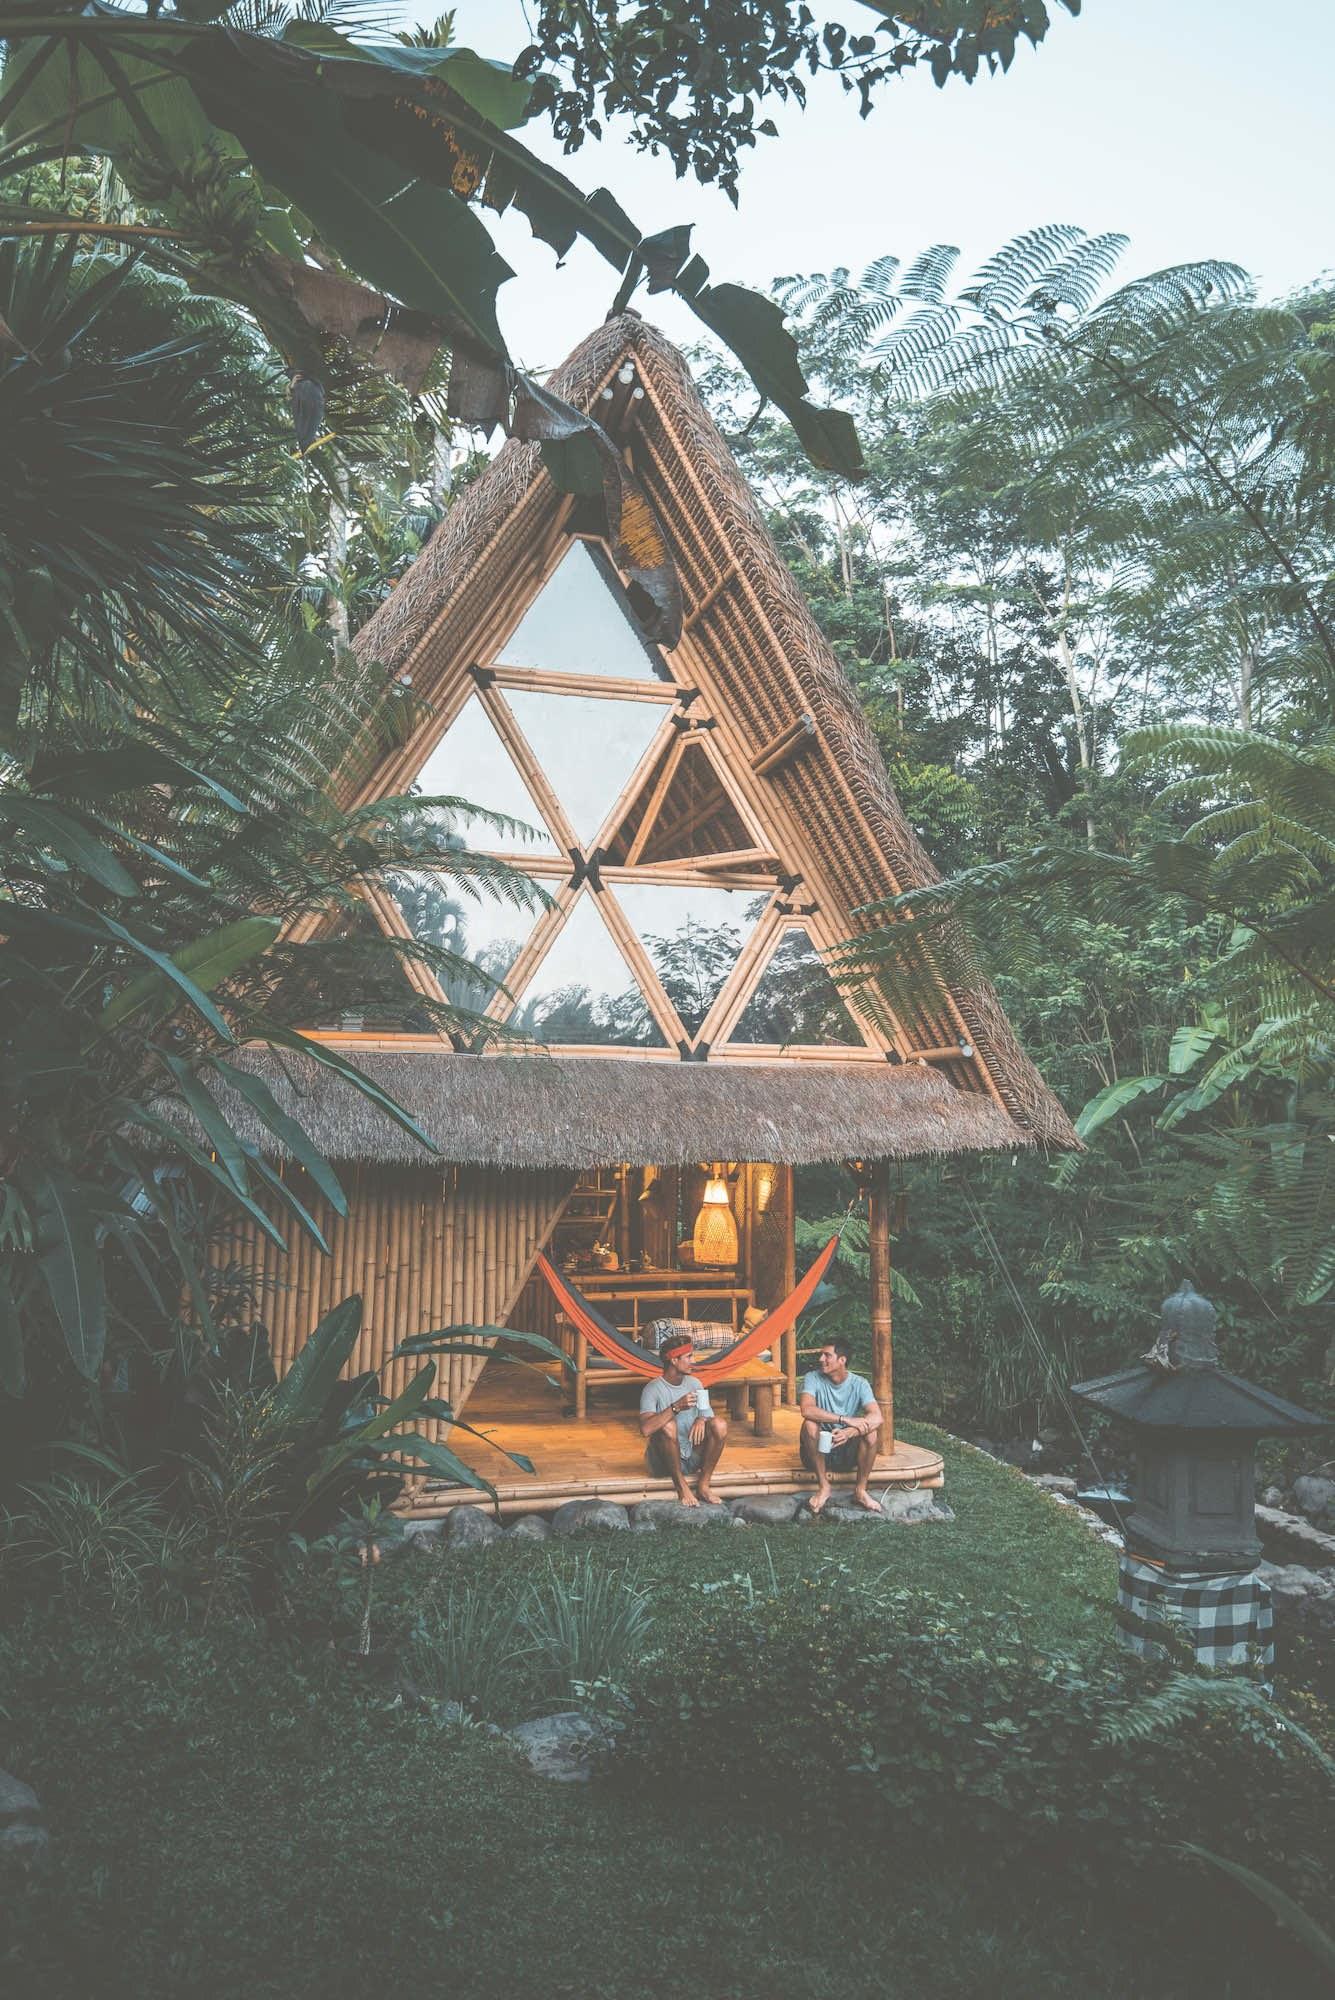 5 Rumah Mungil di Dunia, Salah Satunya Ada di Bali